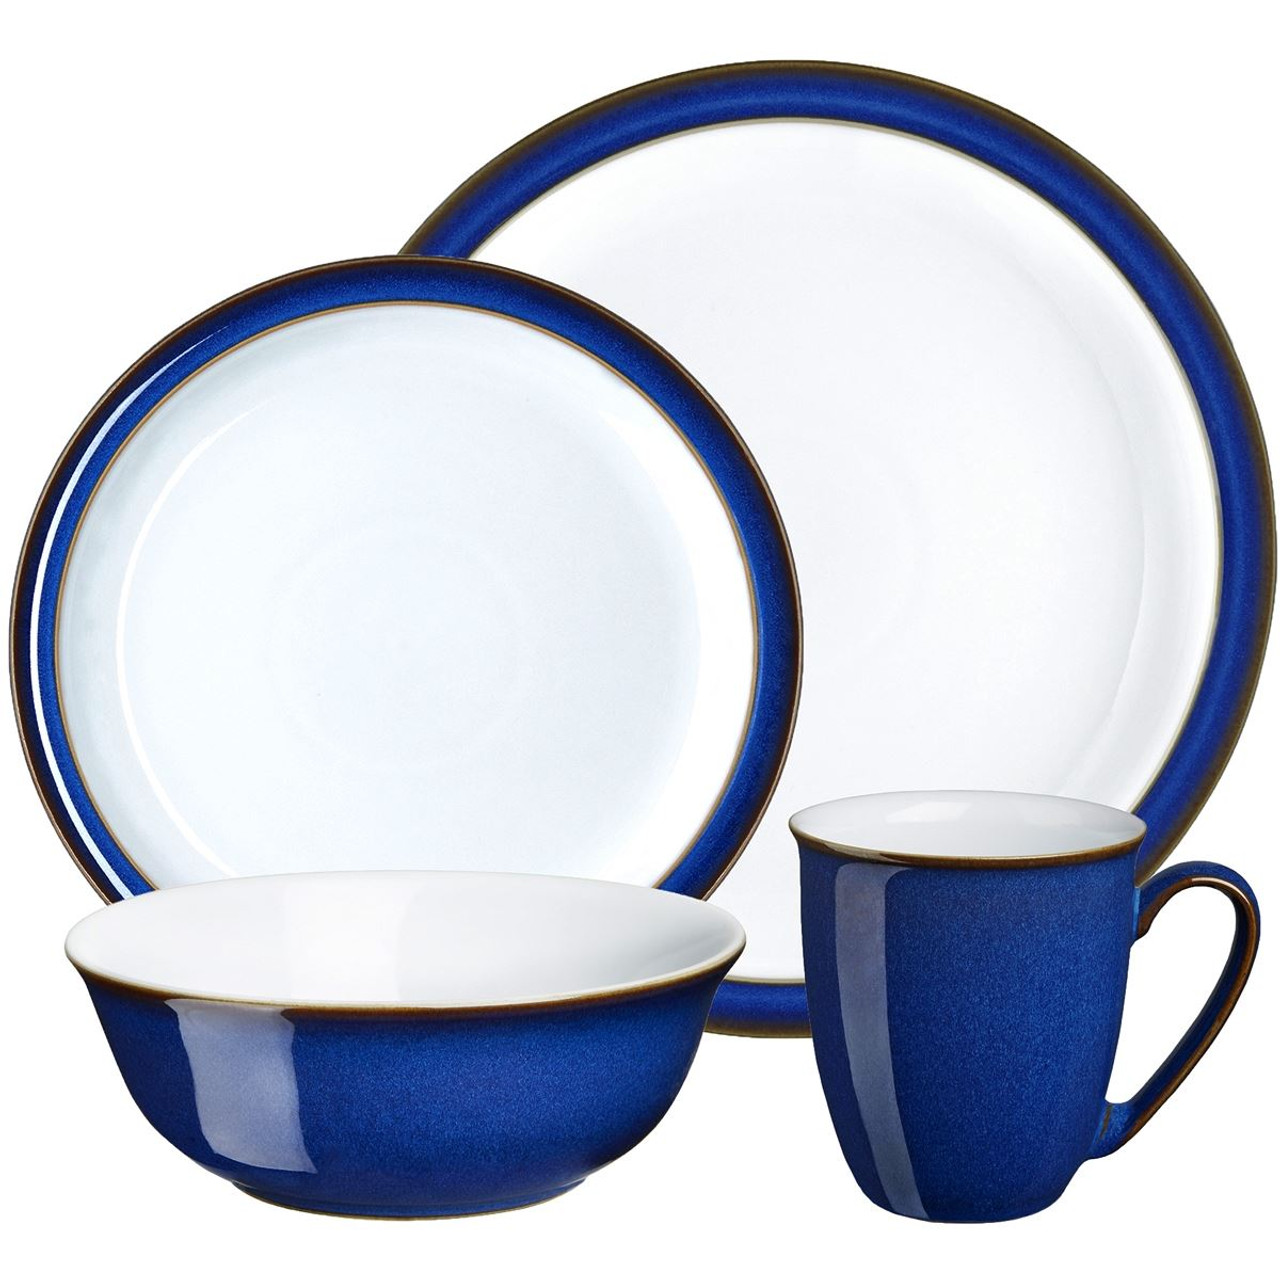 Denby Imperial Blue 16 Piece Dinner Set